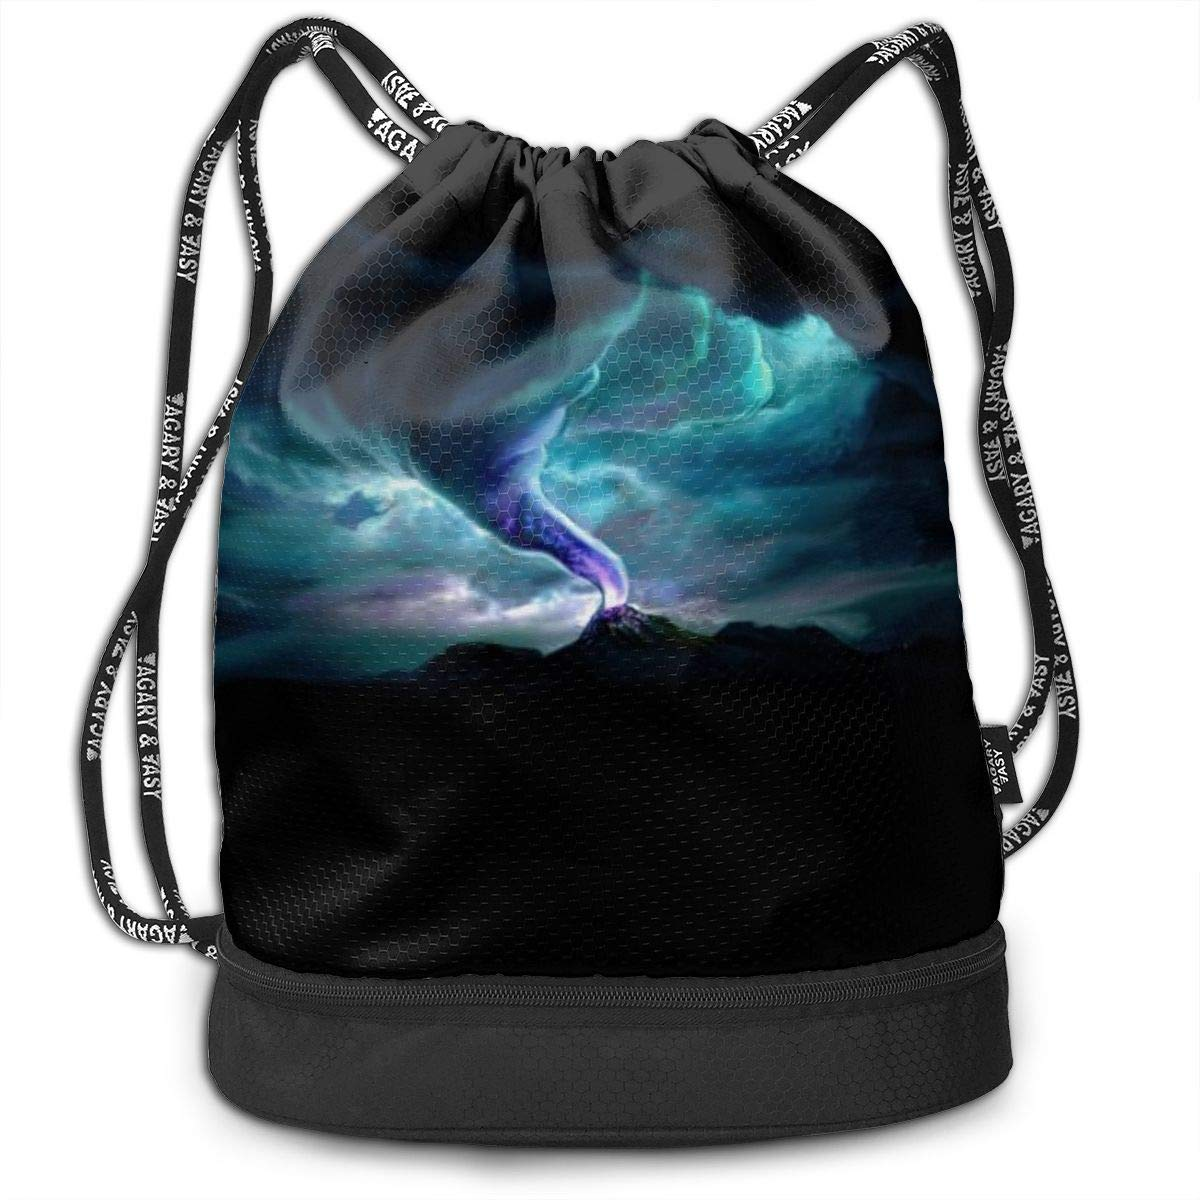 Women Kji Gym Sack Drawstring Bag Tornado Horrible Printed Sackpack Sport Cinch Pack Backpack for Men